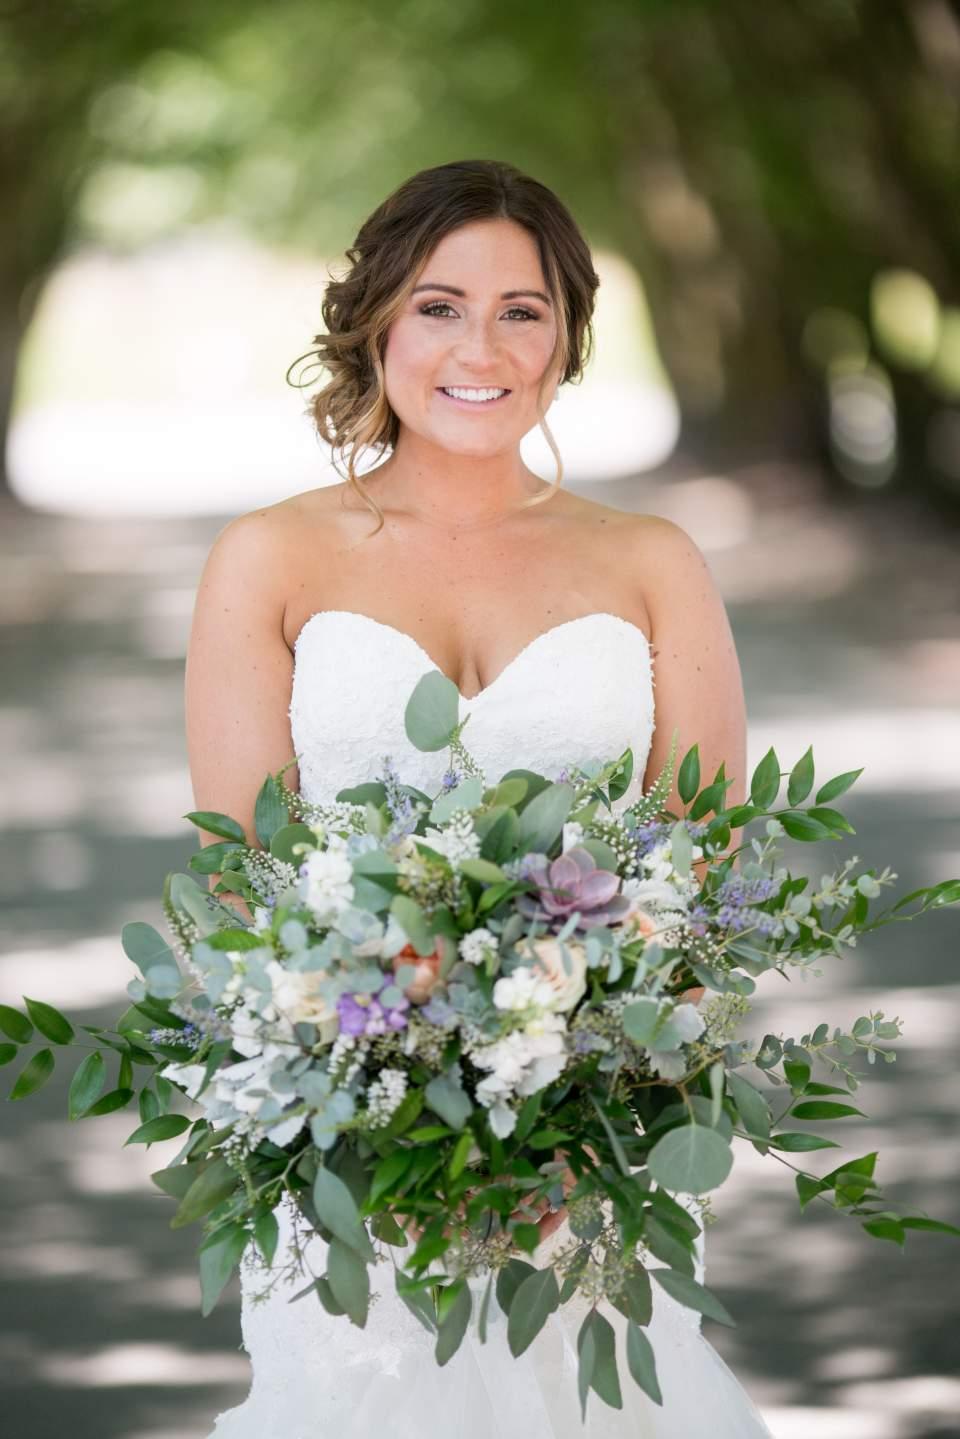 bridal portrait smiling at camera